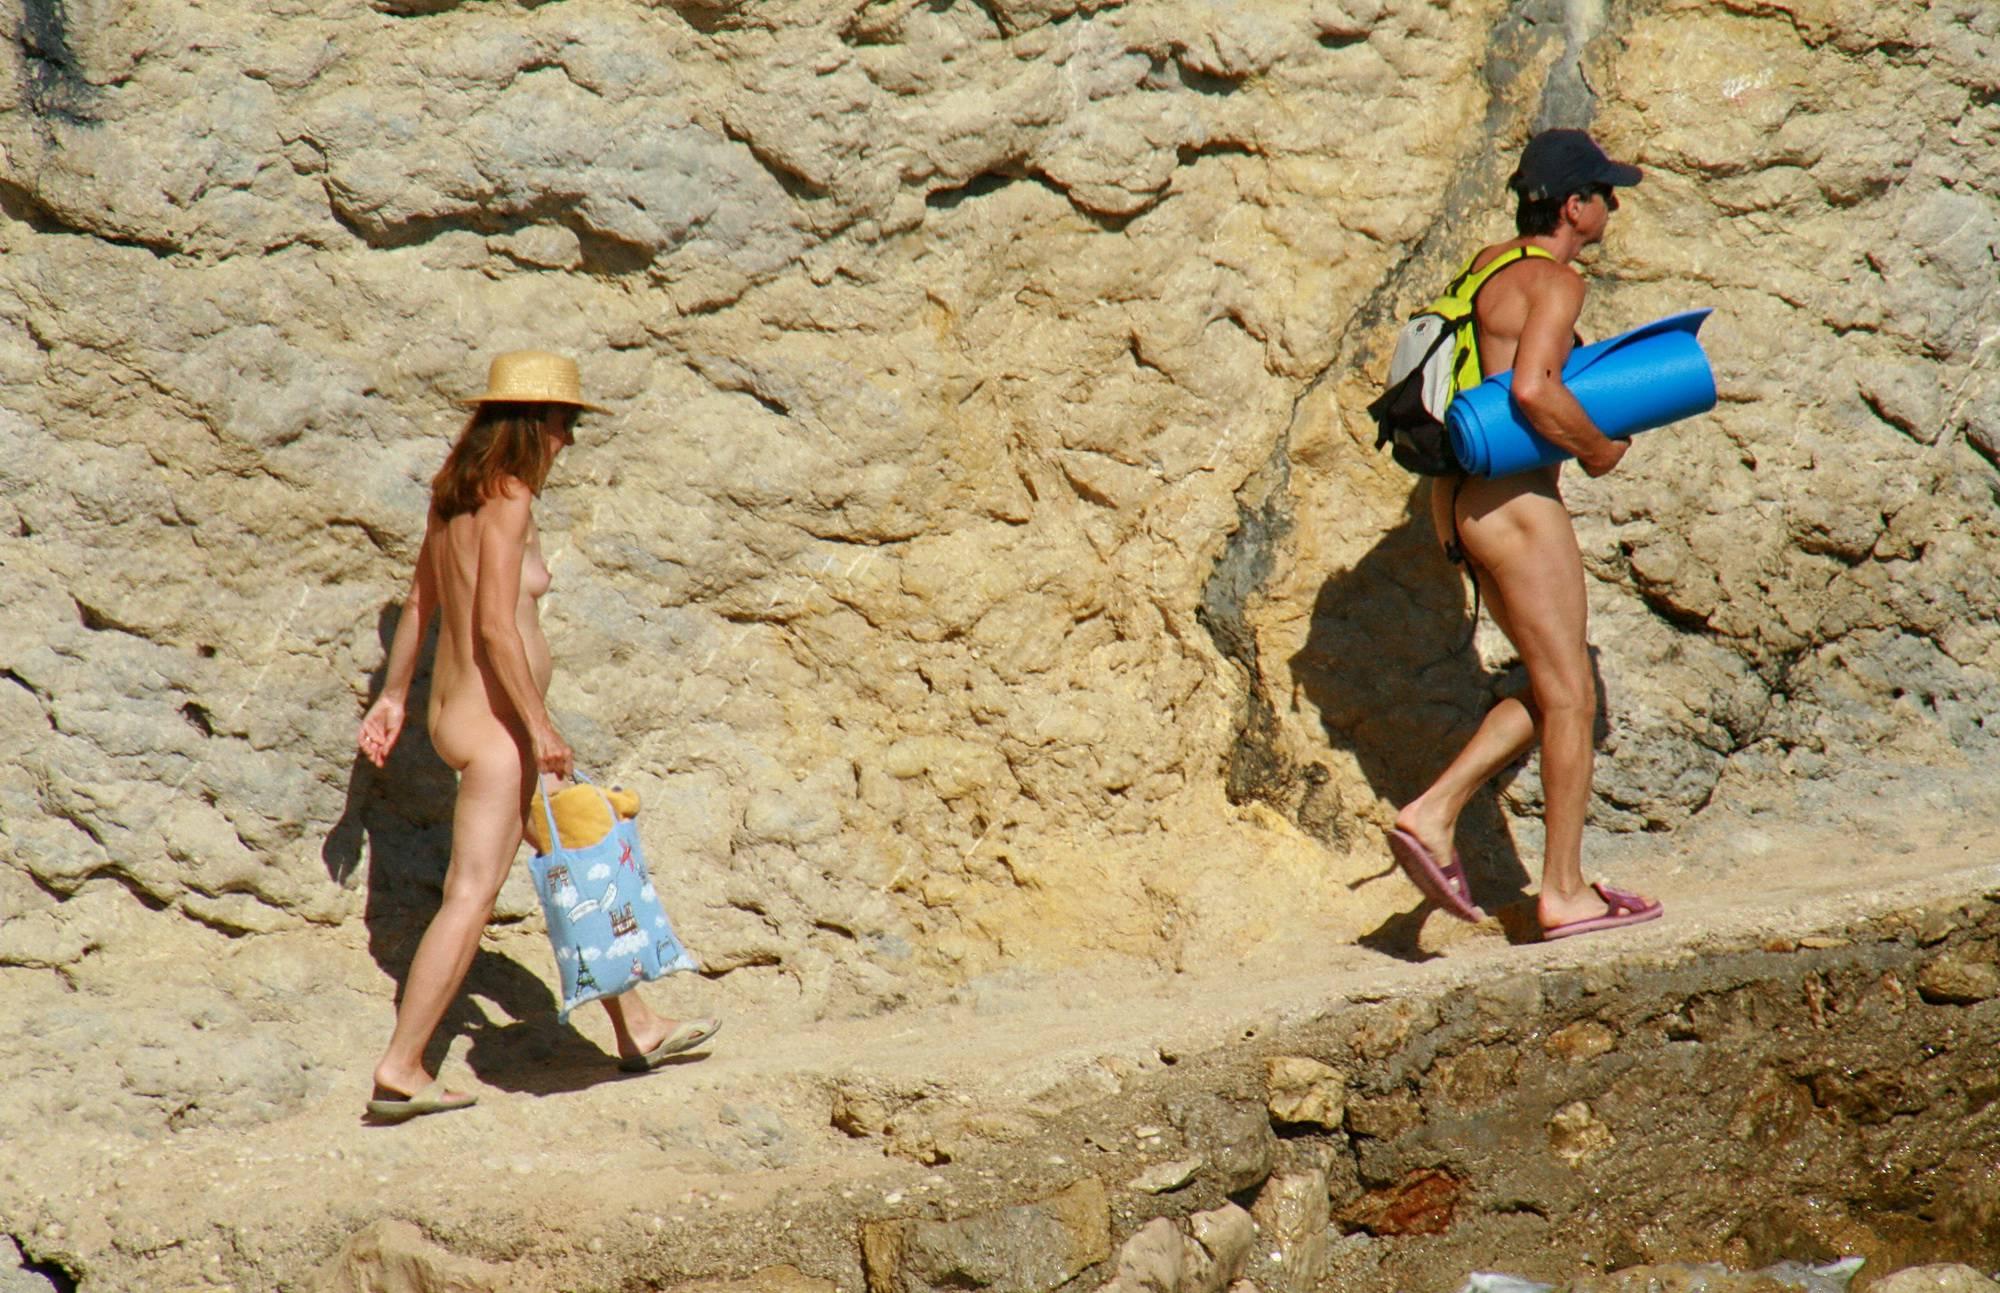 Nudist Mountain Climbers - 2